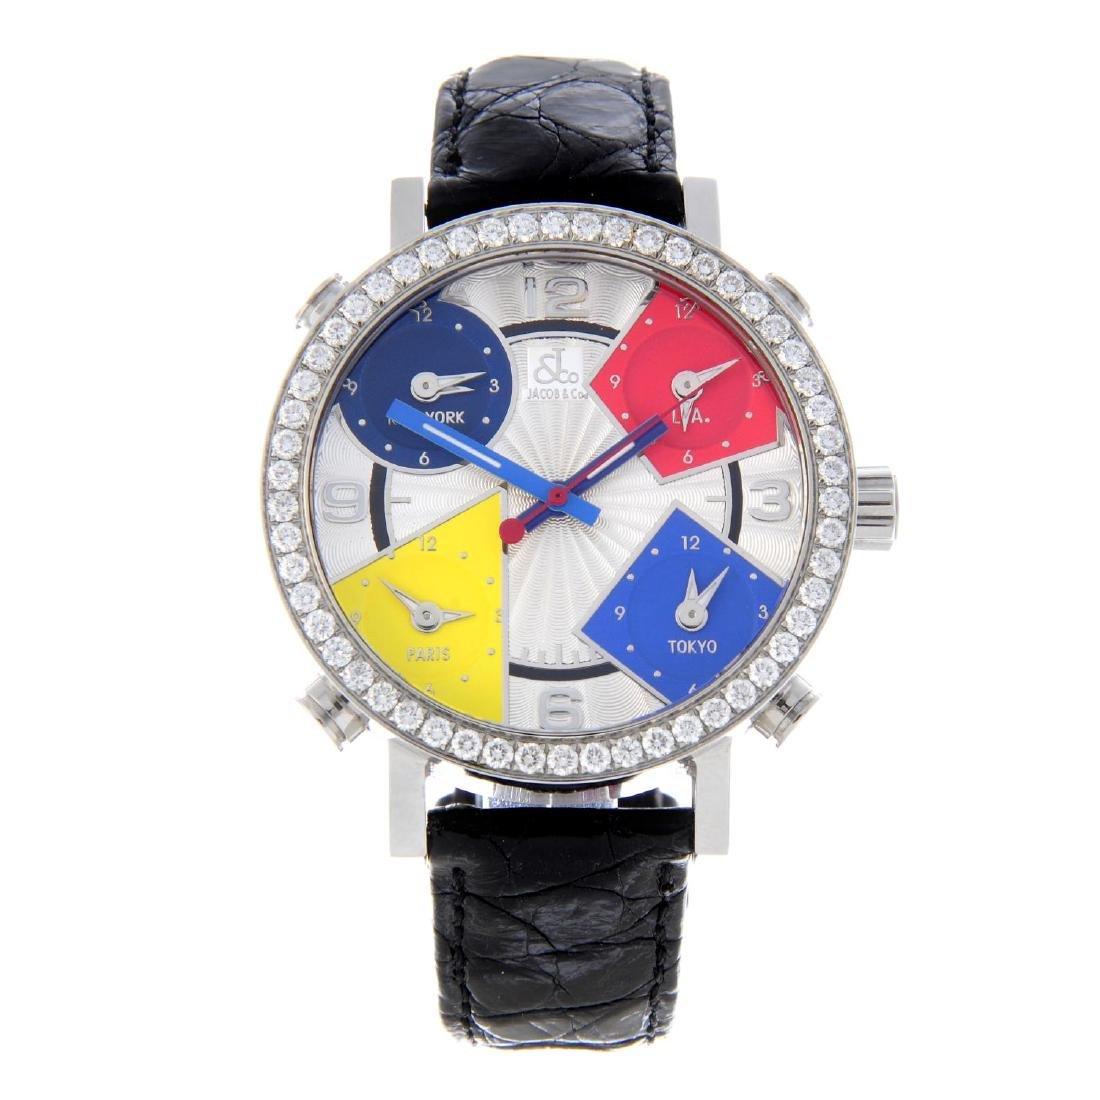 JACOB & CO. - a mid-size Five Time Zone wrist watch.